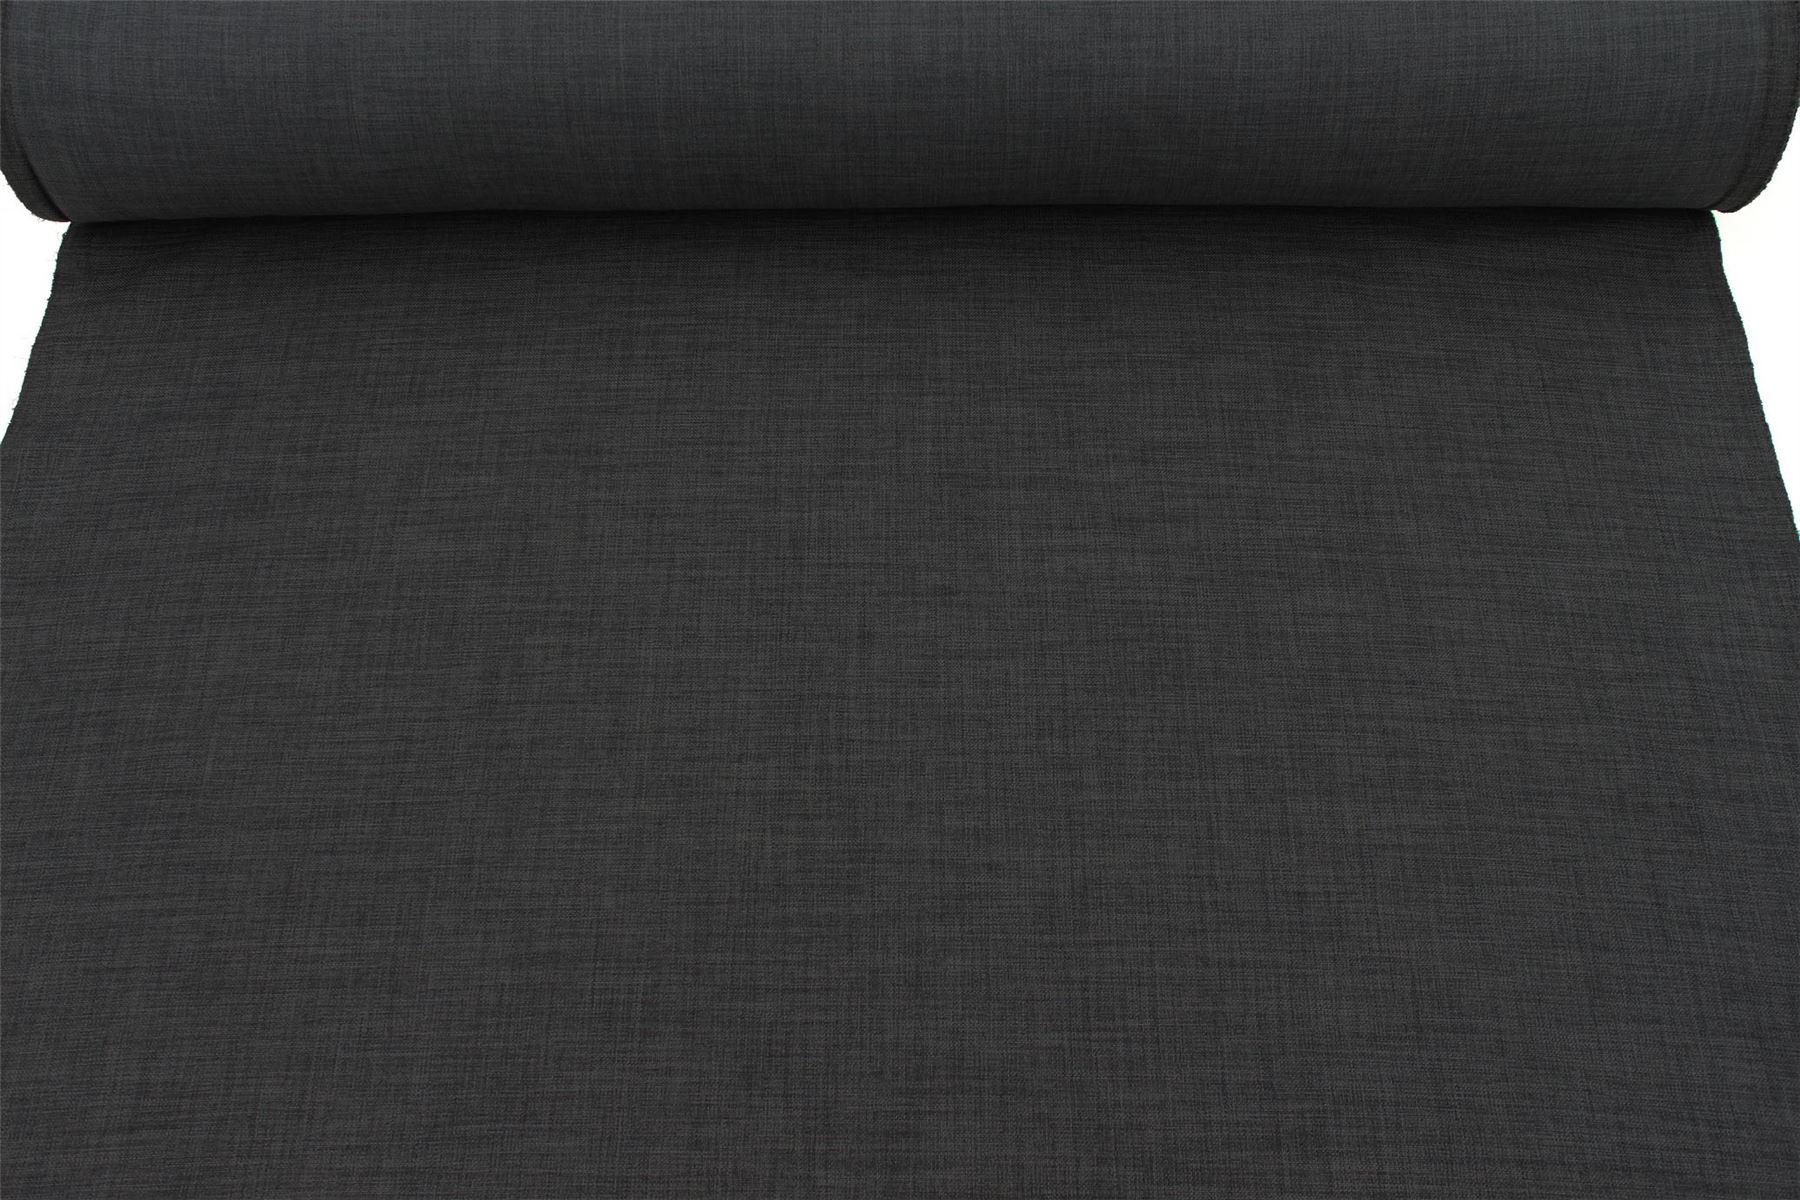 soft sofa material cama nido el corte ingles plain linen look designer curtain cushion